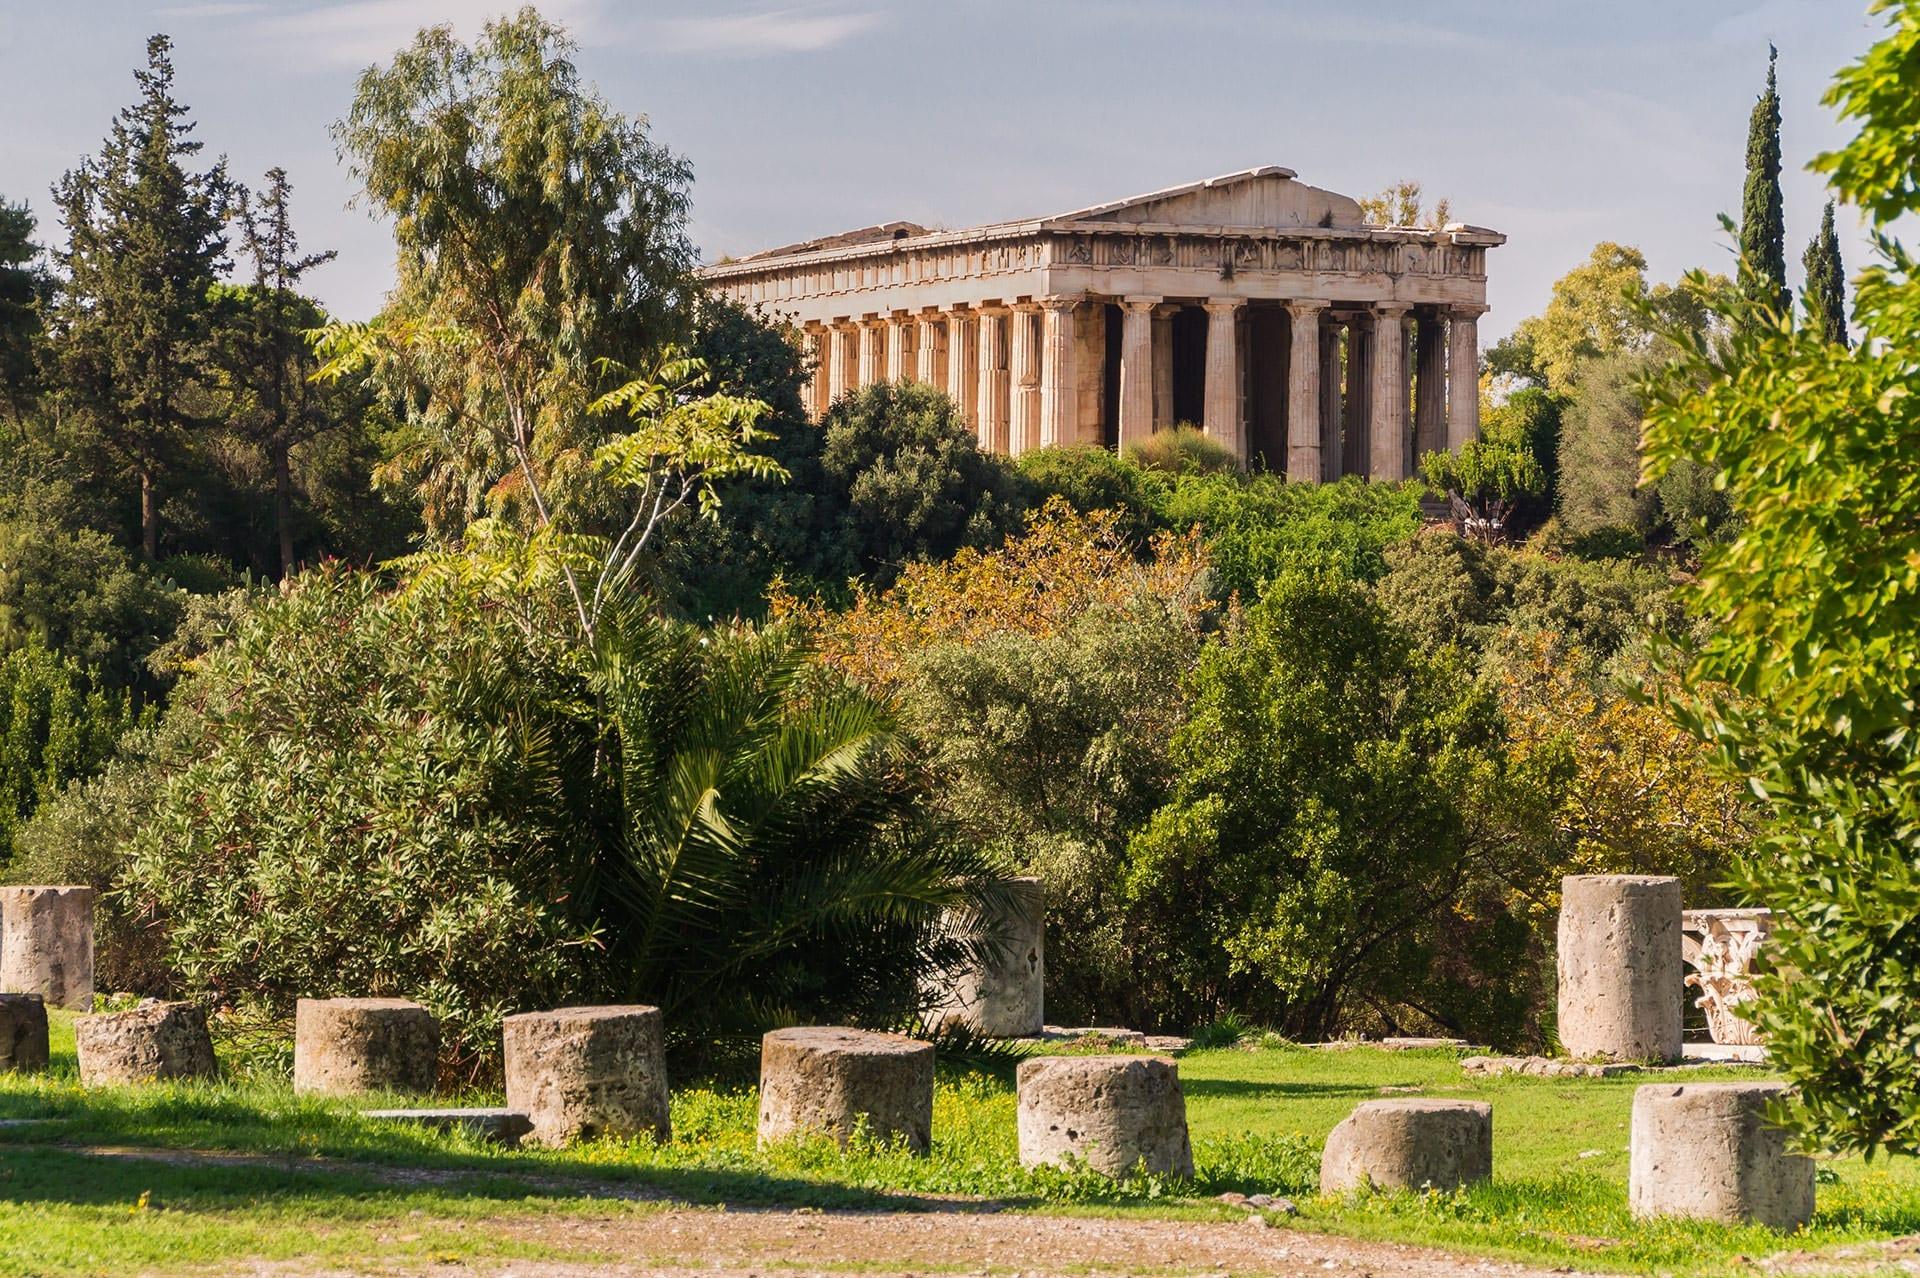 AA (8 hours): [Athens] Mythology, Acropolis museum & Acropolis tour